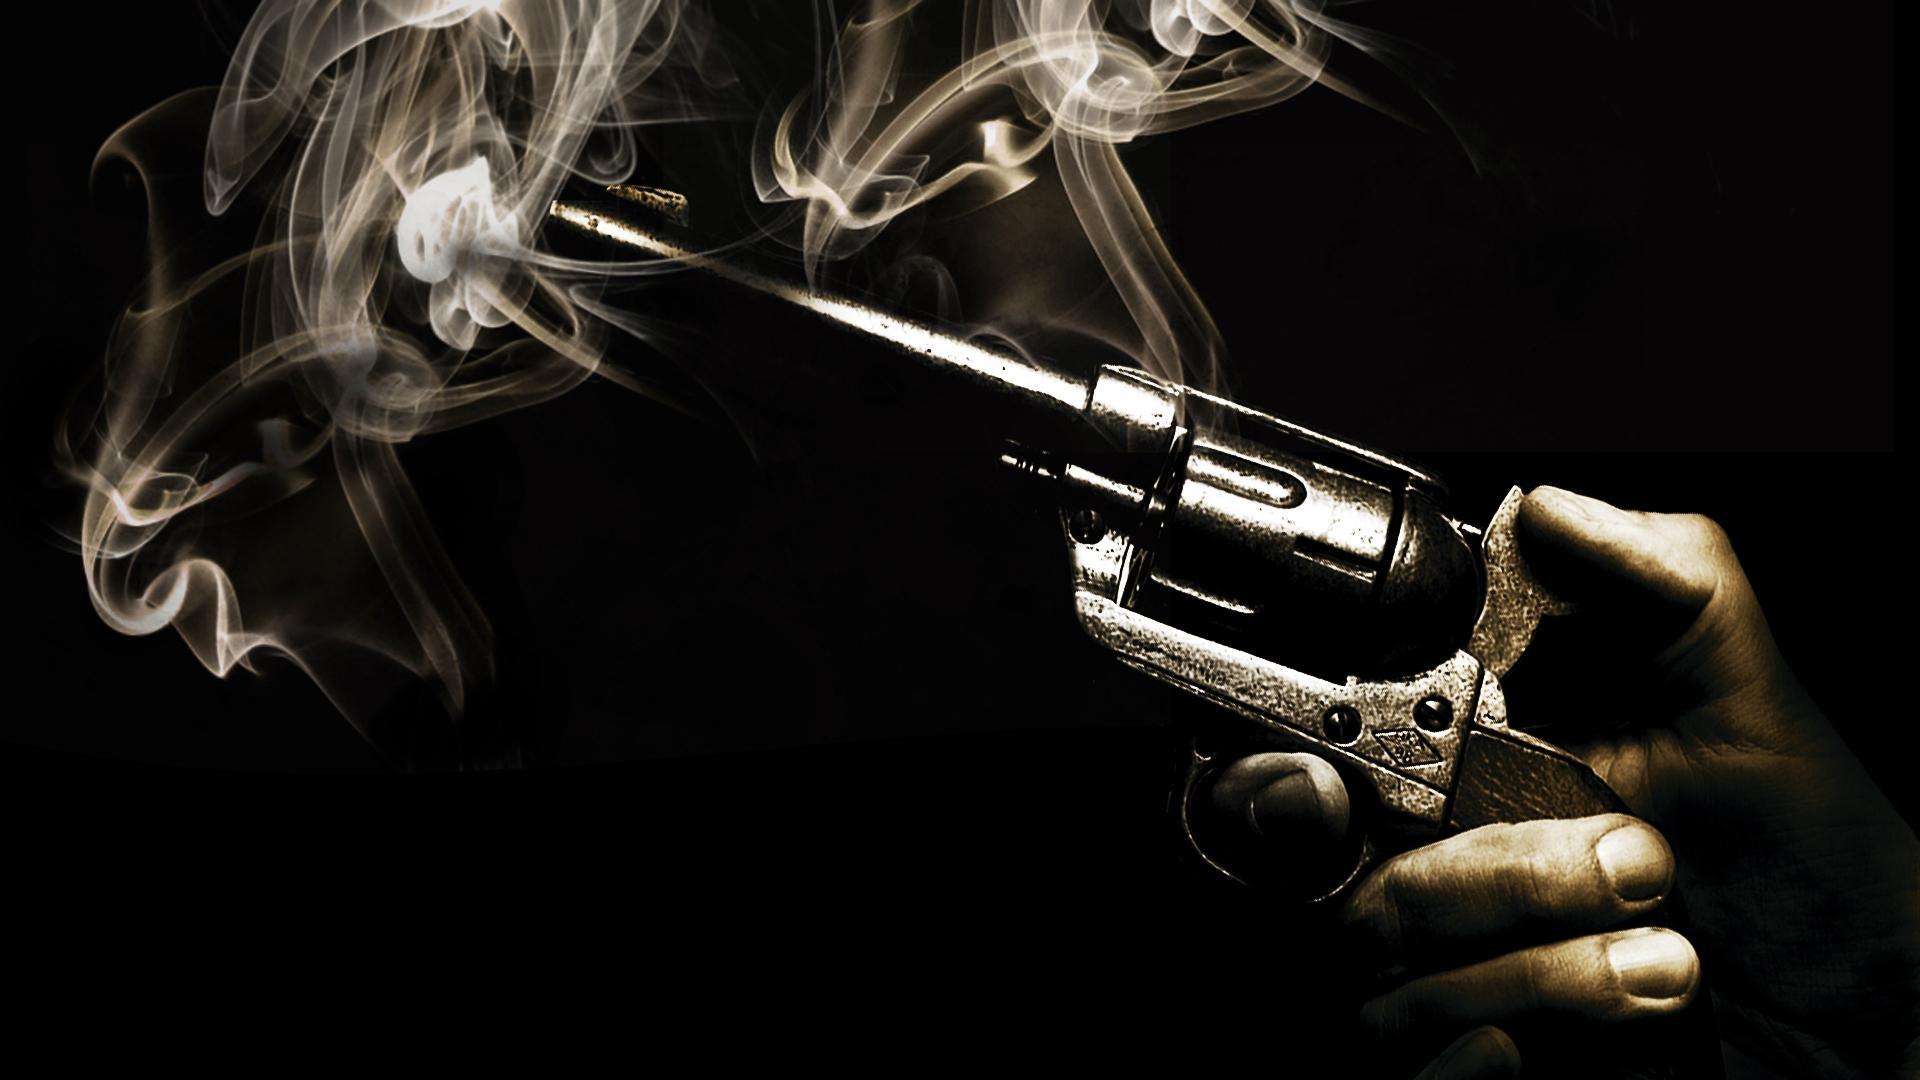 revolver hd wallpaper | background image | 1920x1080 | id:605230